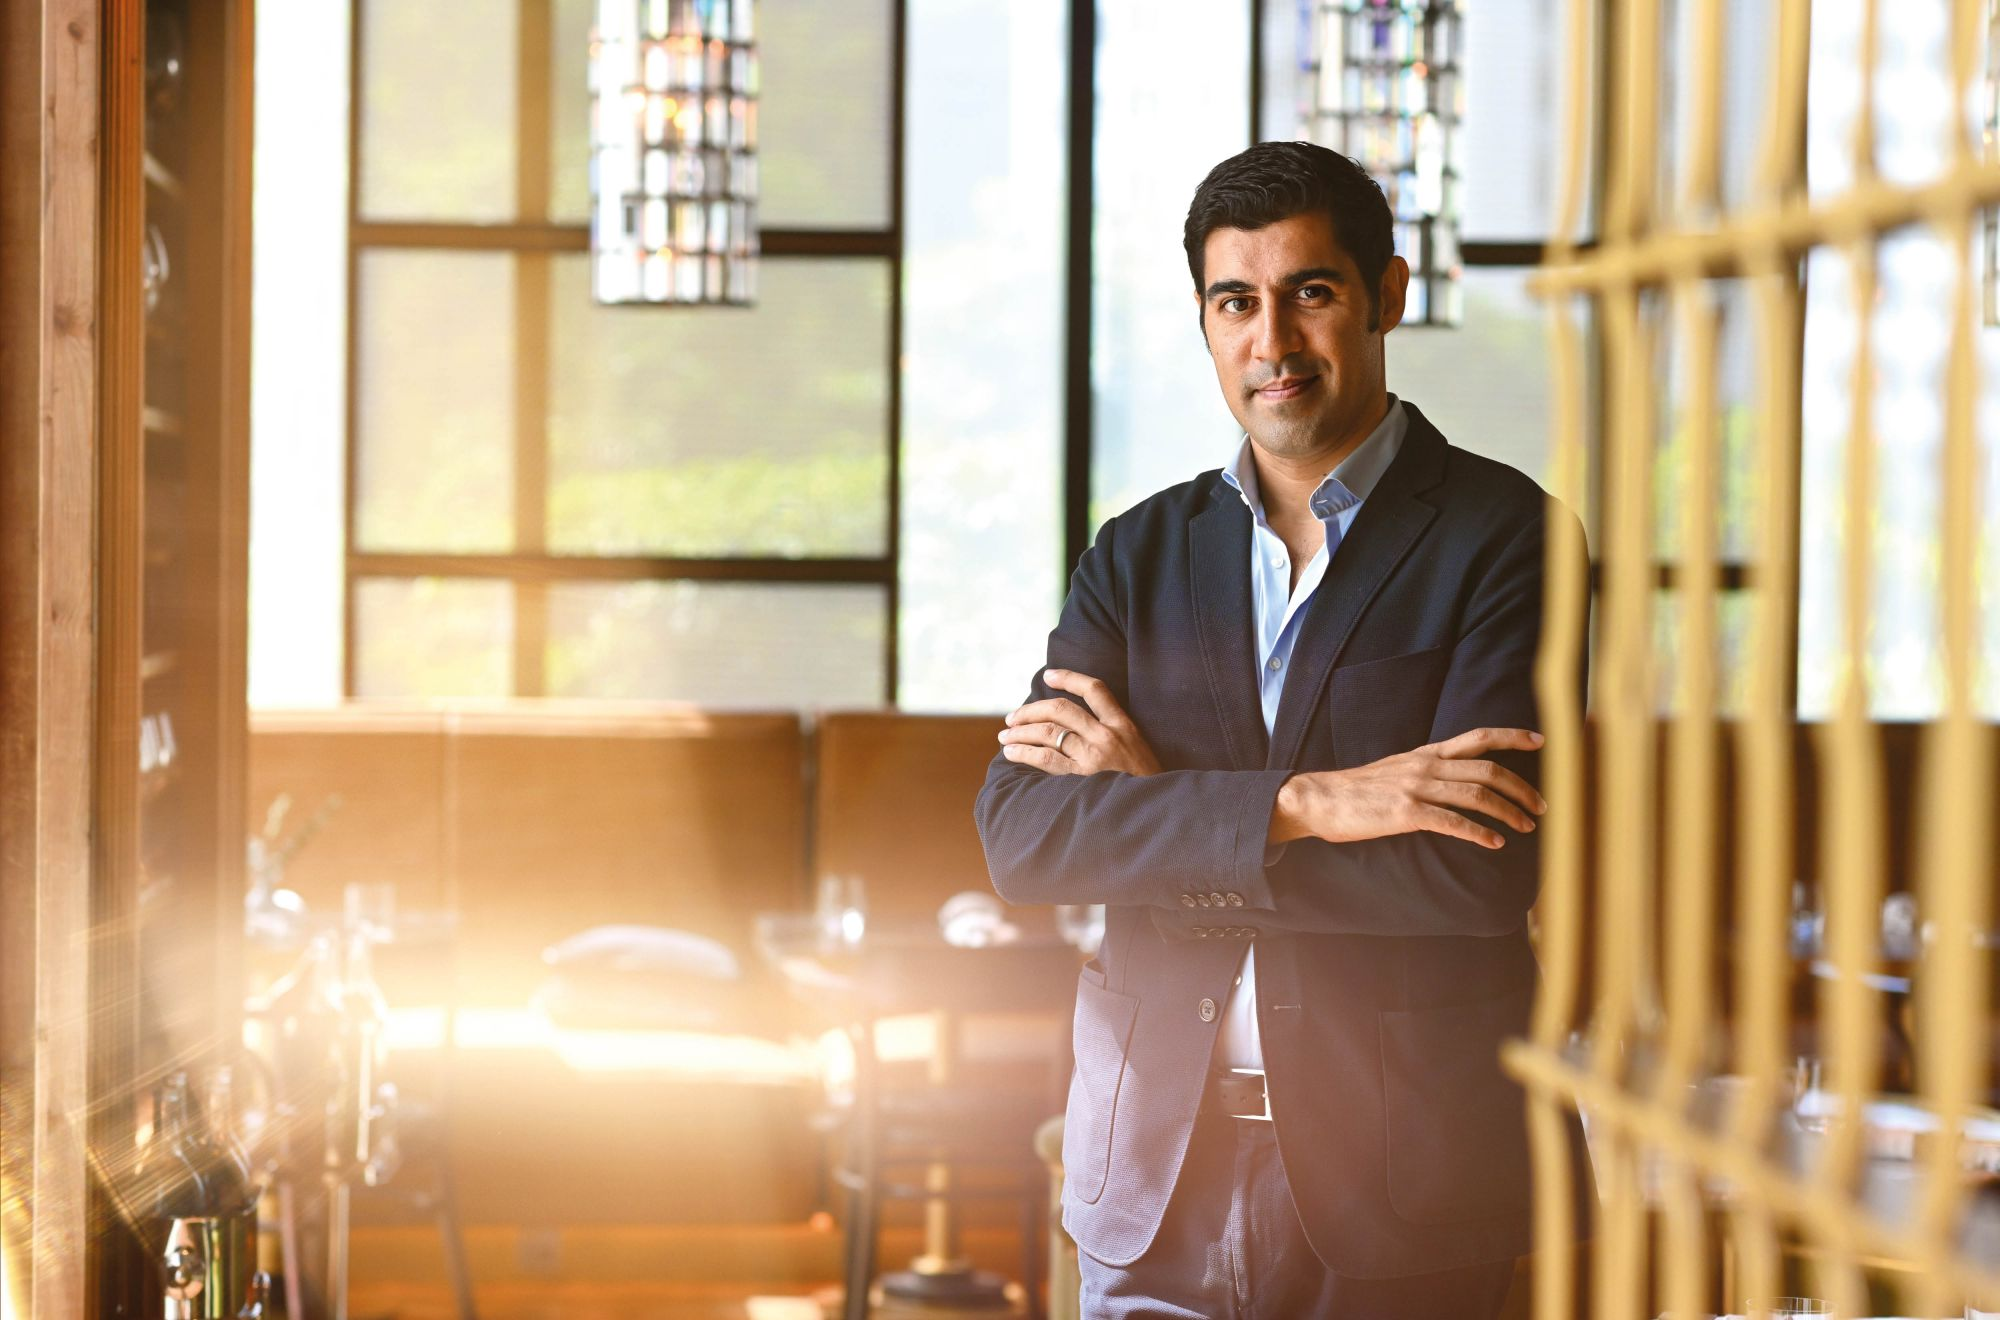 Tatler Takes 5: Parag Khanna, The Global Futurist